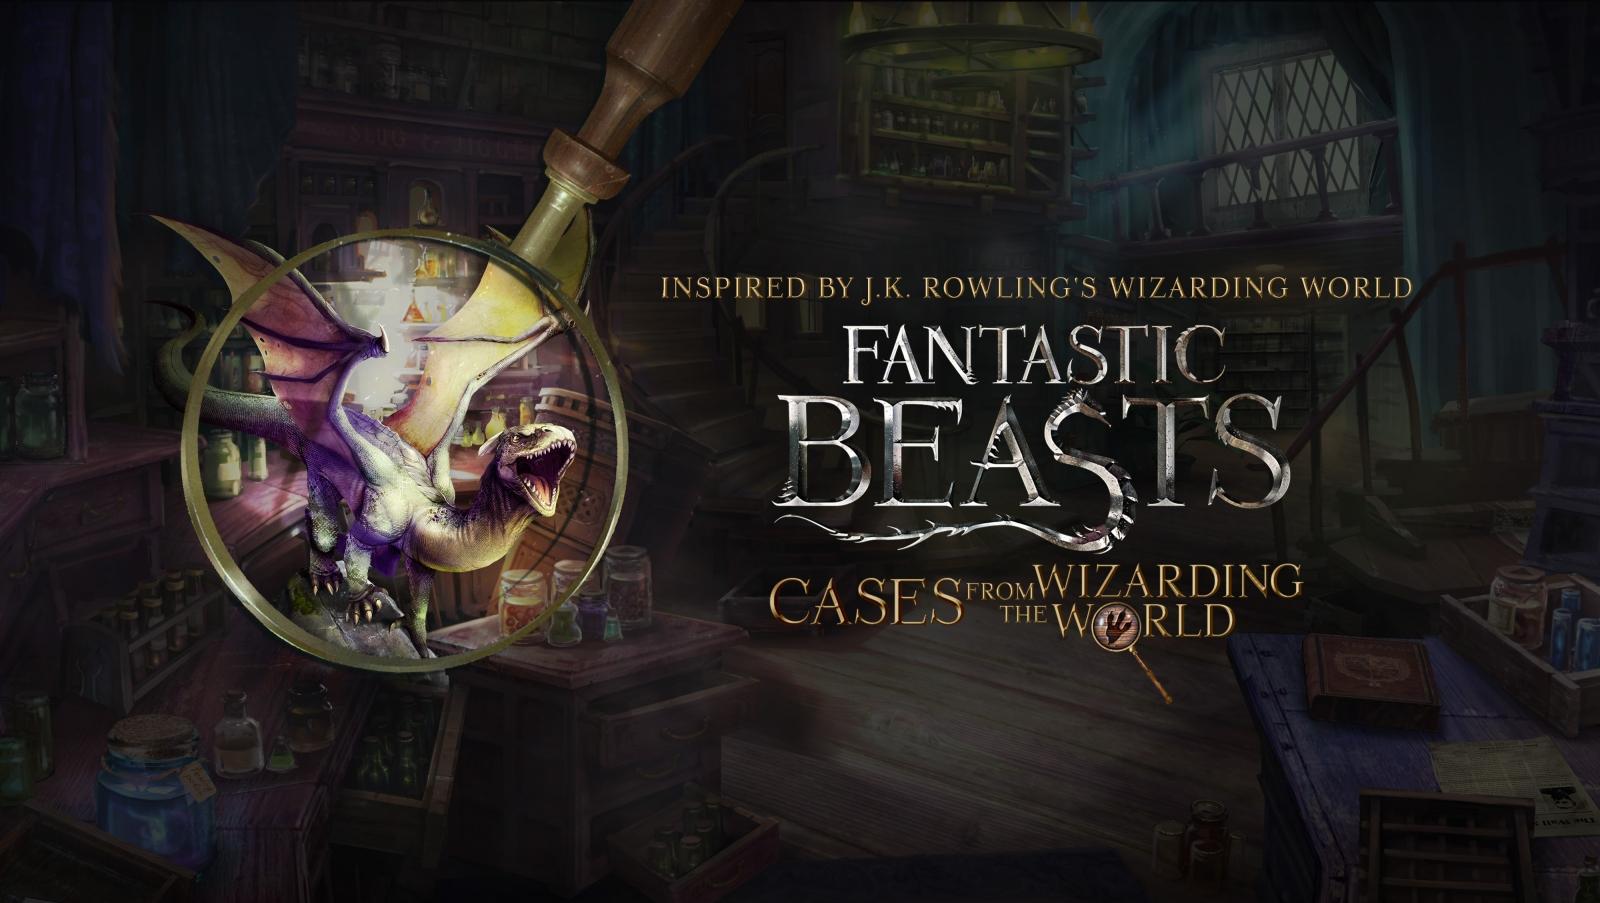 Fantastic Beasts mobile game